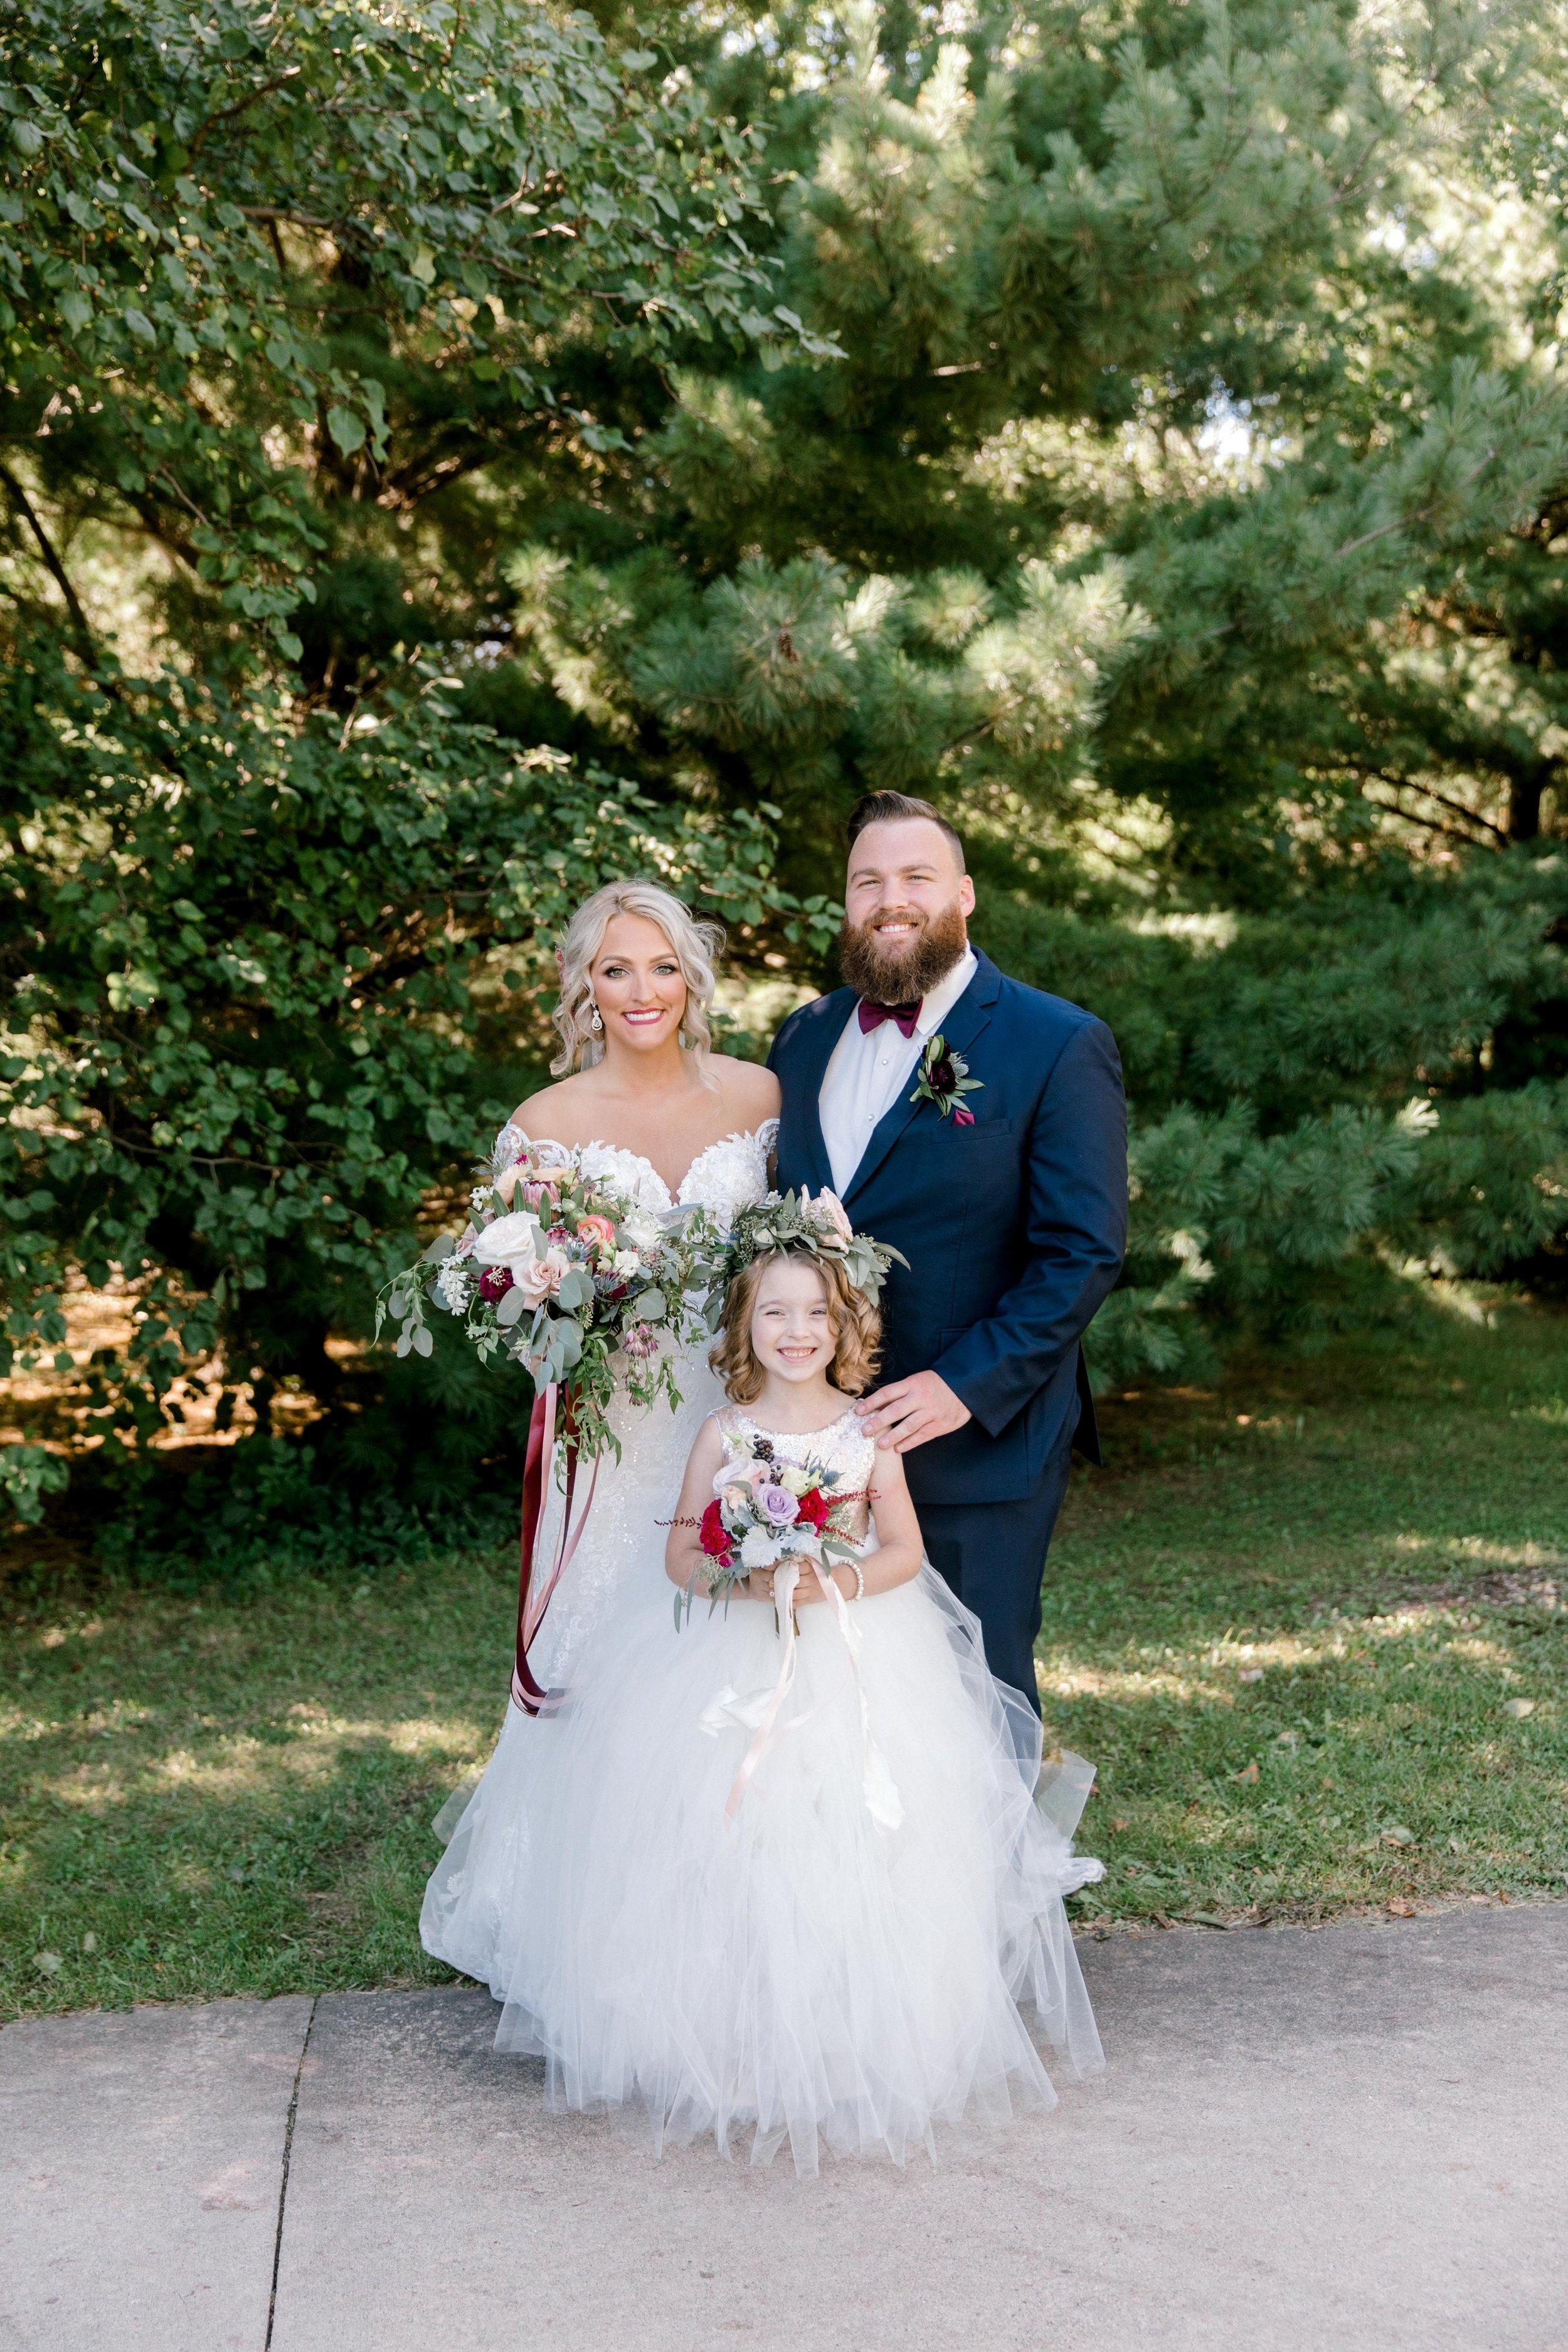 Ryan Alexa Married-Formals Ceremony-0033.jpg